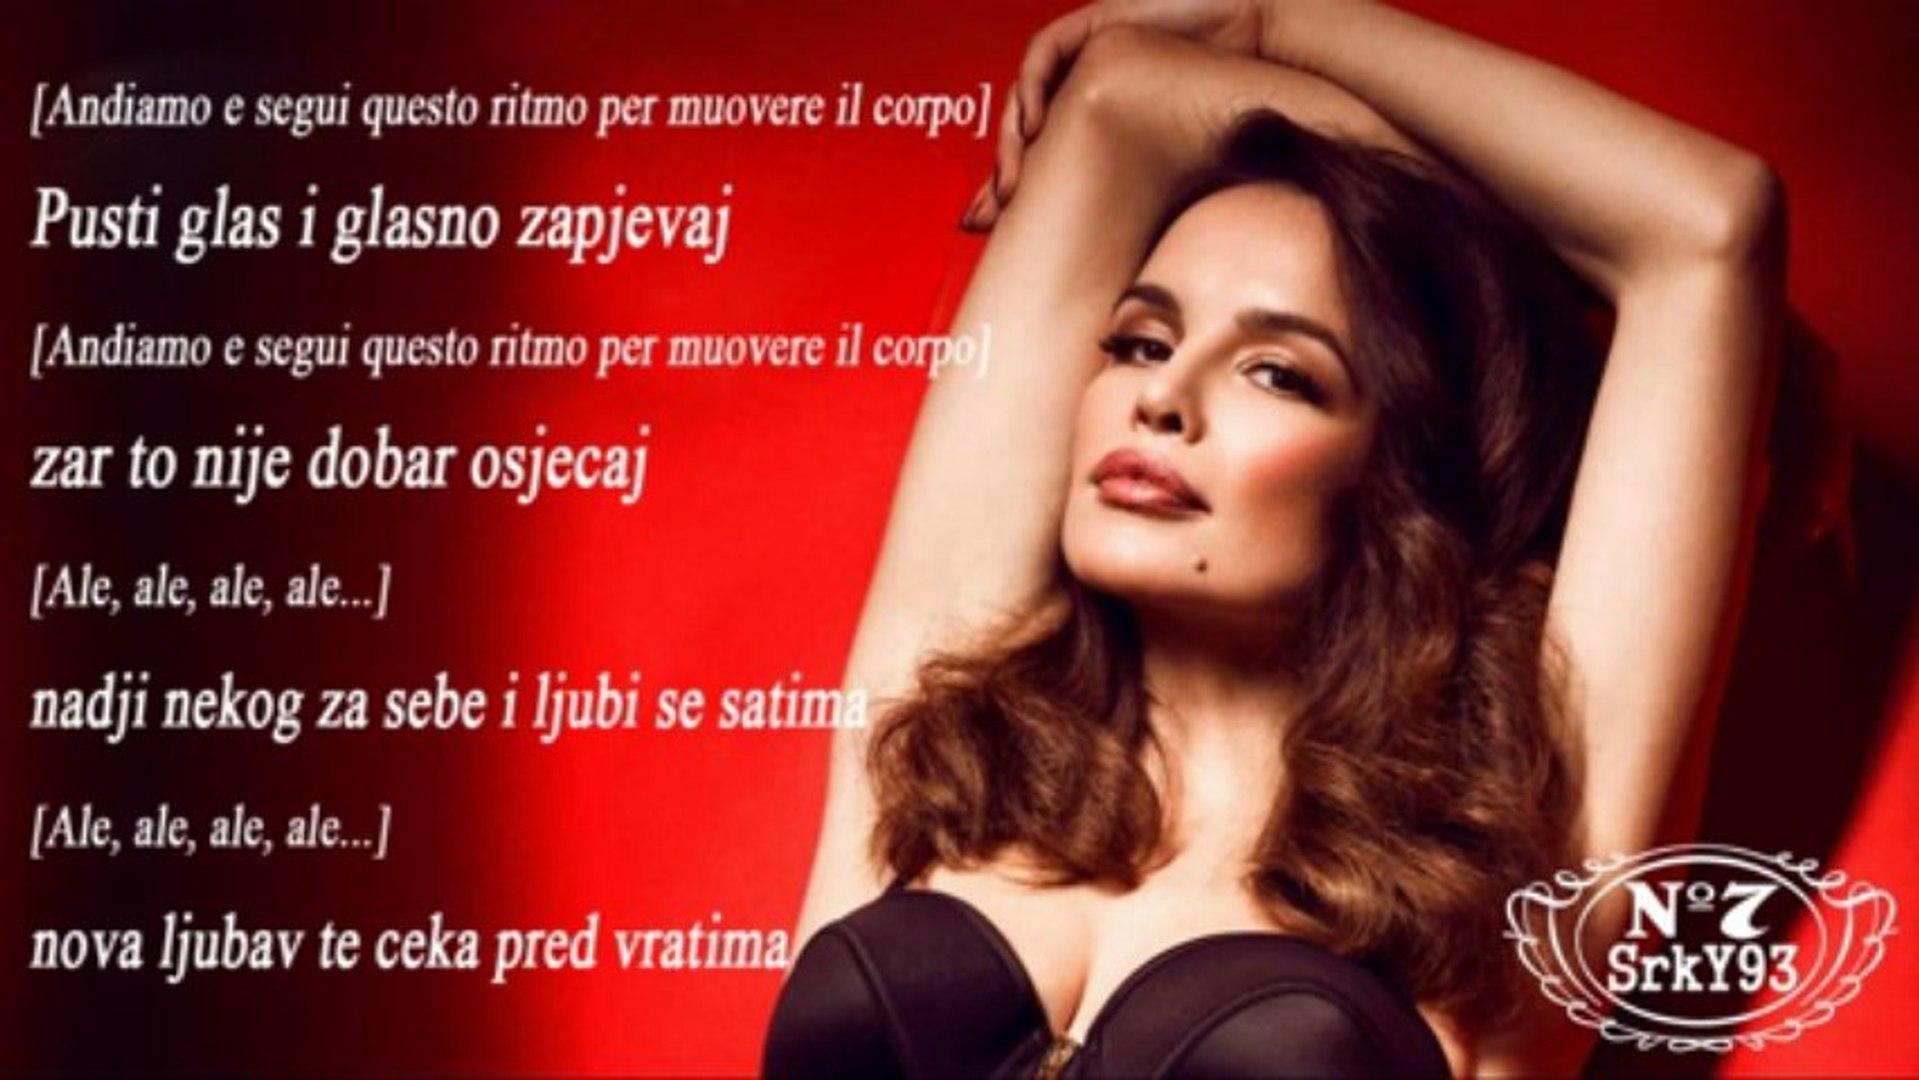 Severina - 2013 - 04 - Italiana + Tekst